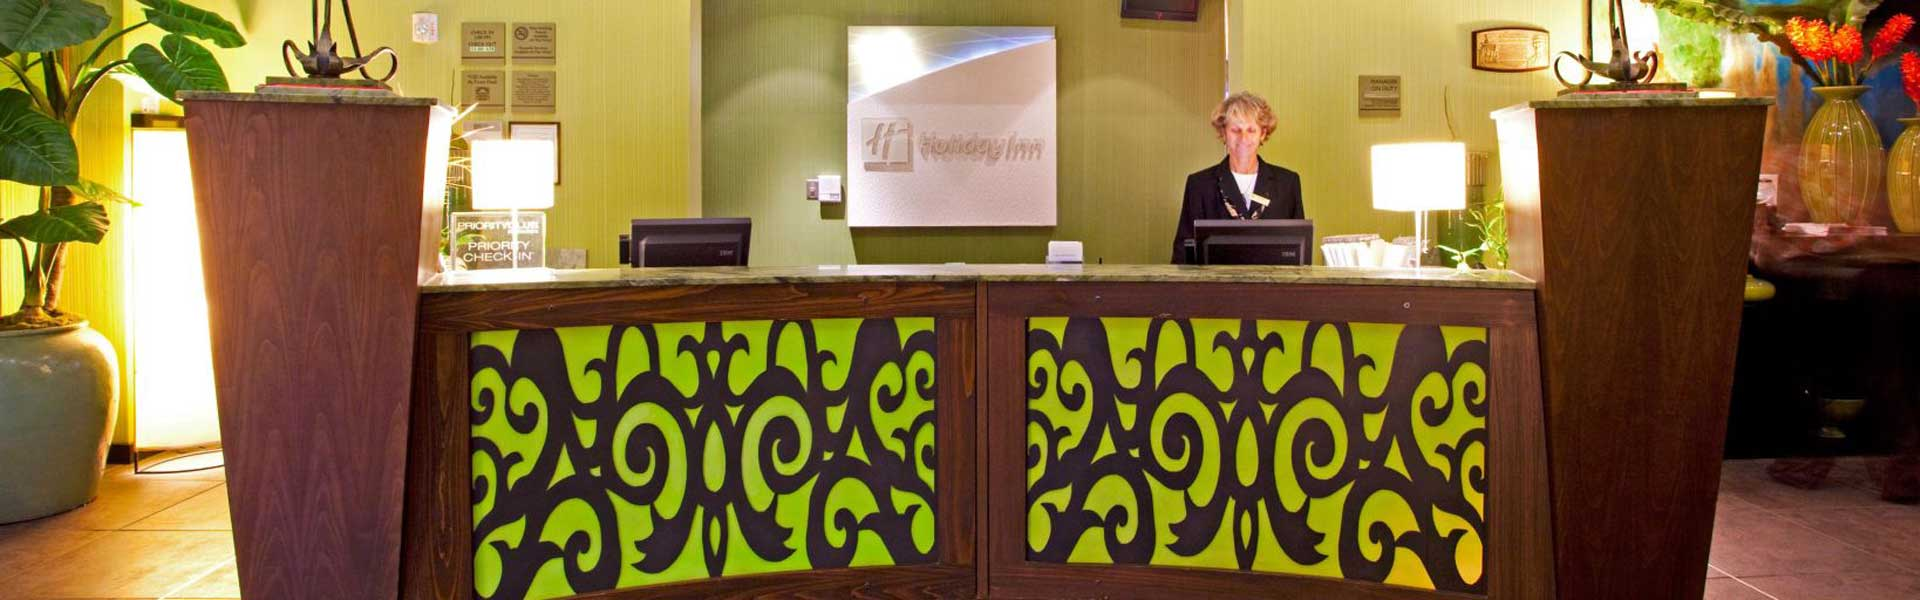 Holiday Inn & Suites Ocala Conference Center Ocala, Florida